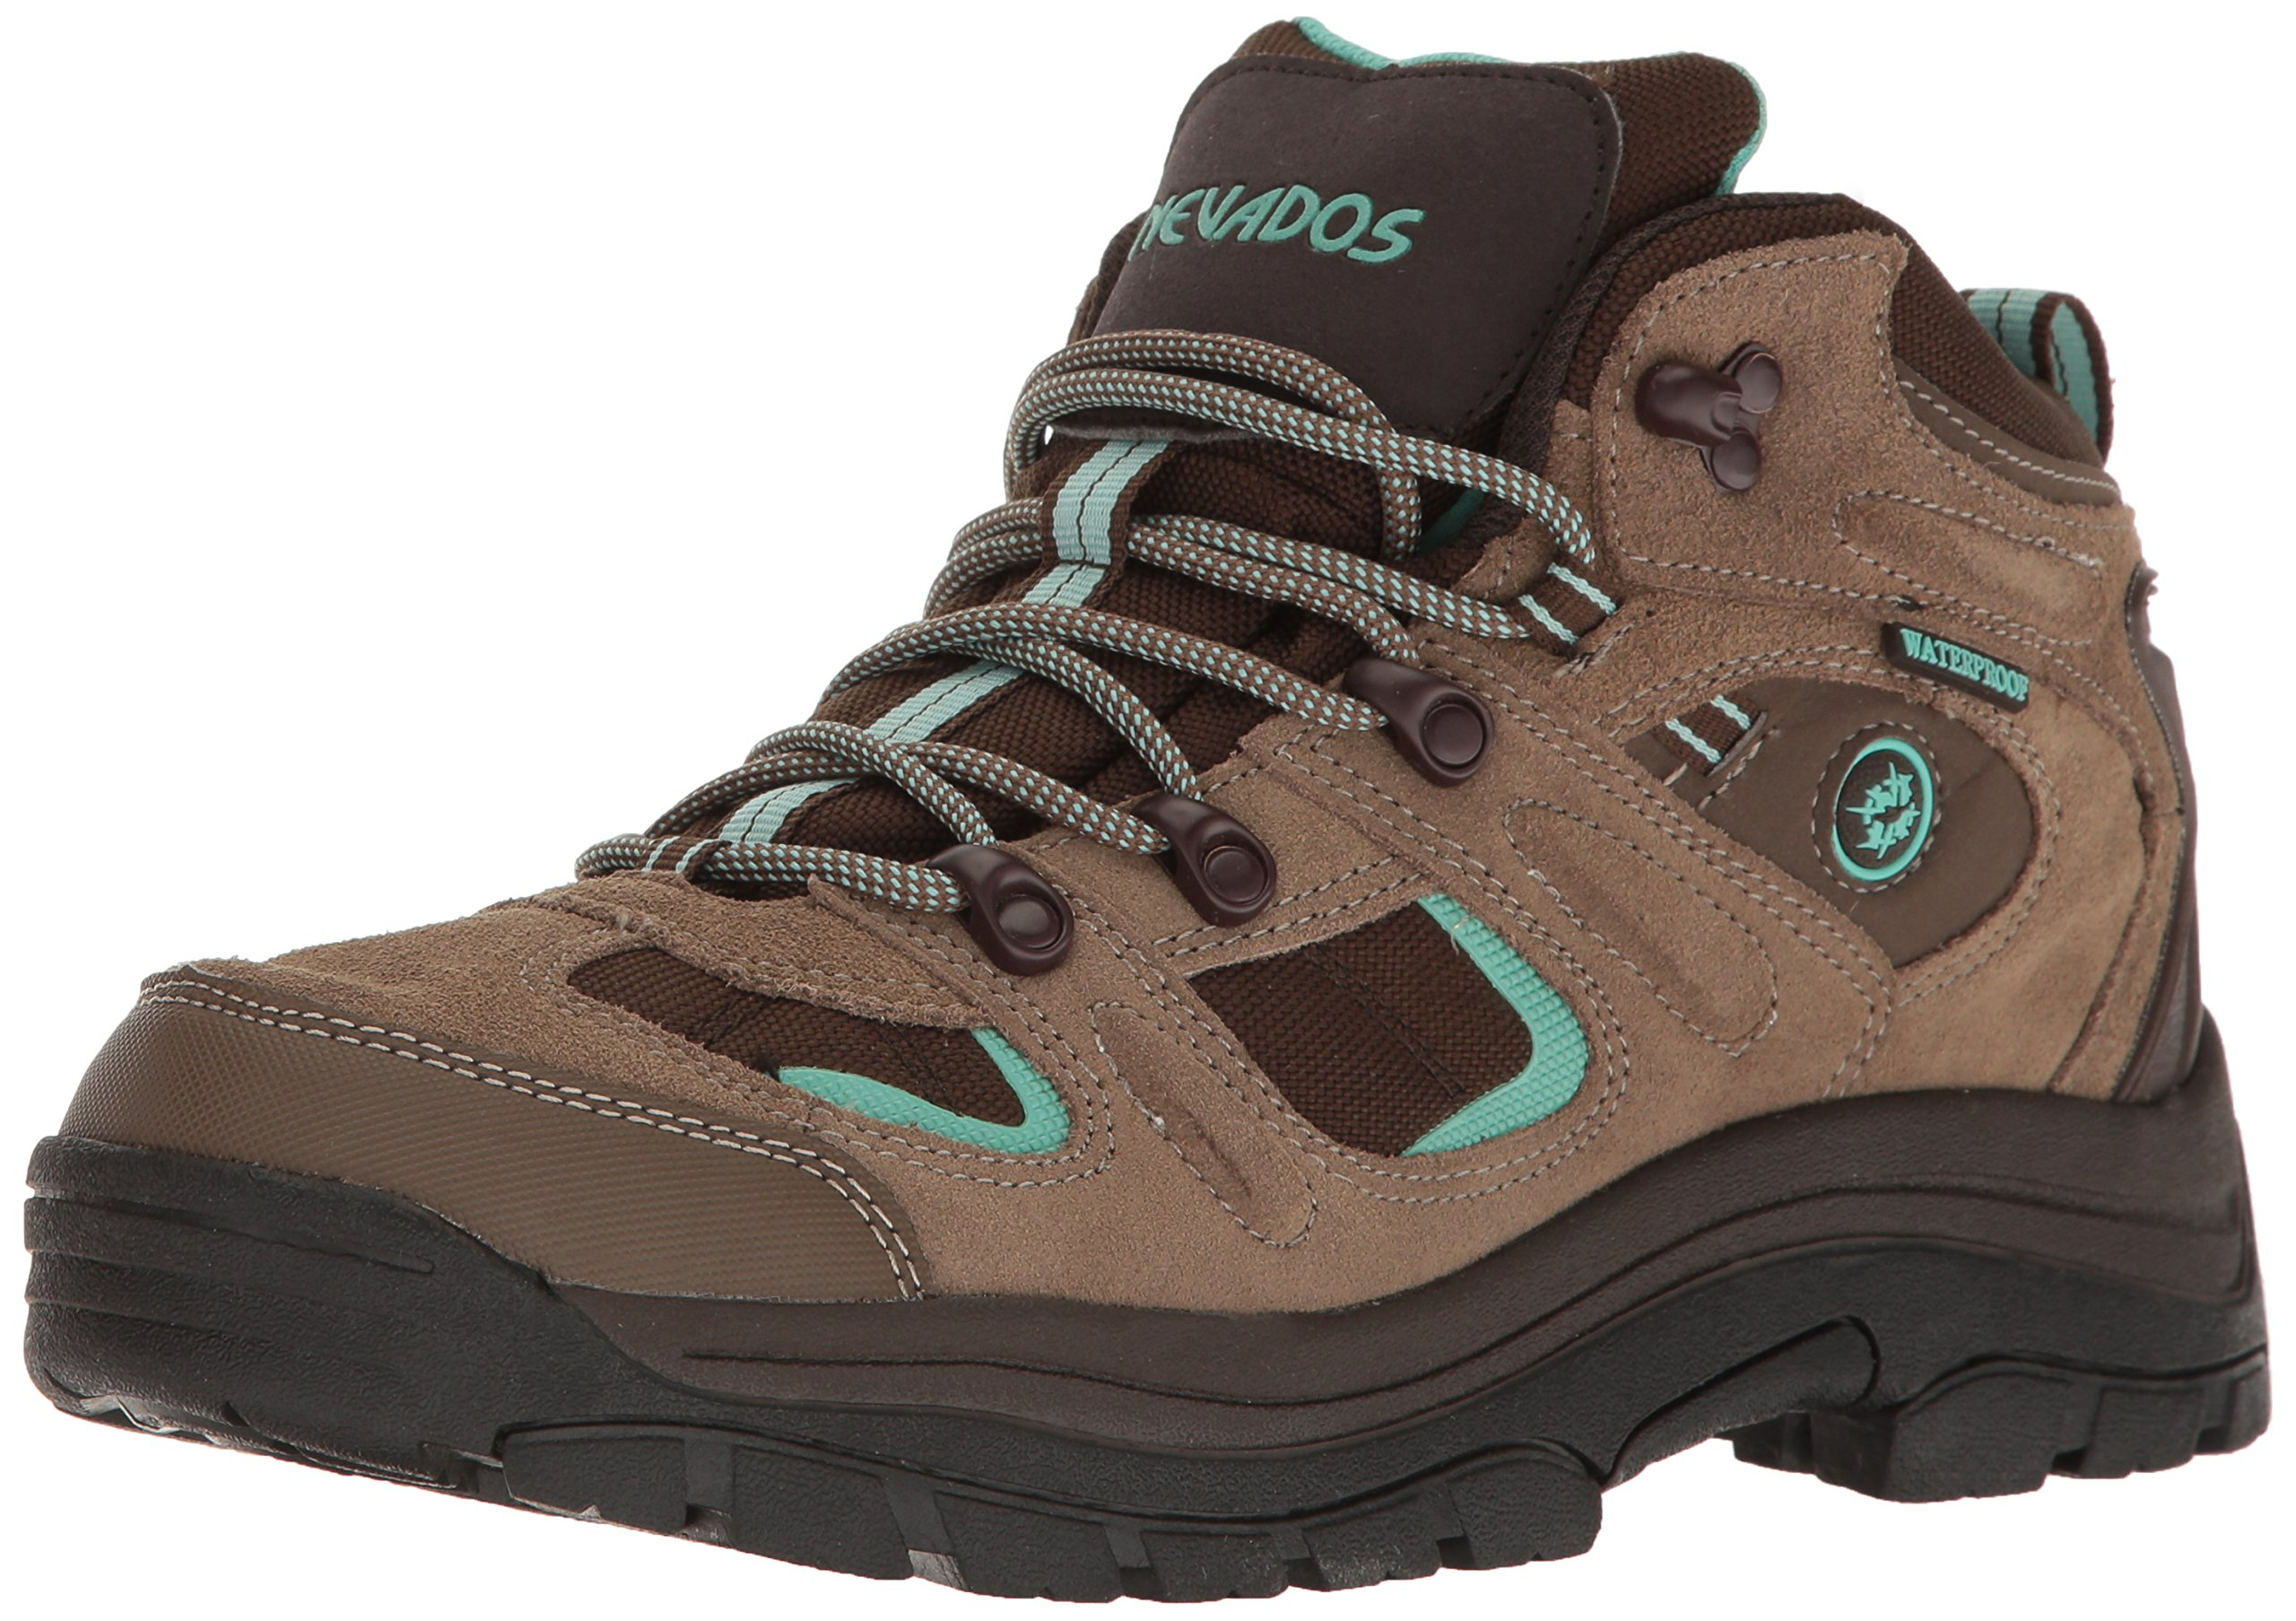 Nevados Women's Klondike Mid Waterproof Hiking Boot,Shiitake Brown/Dark Chestnut/Vivid Aqua,9 M US